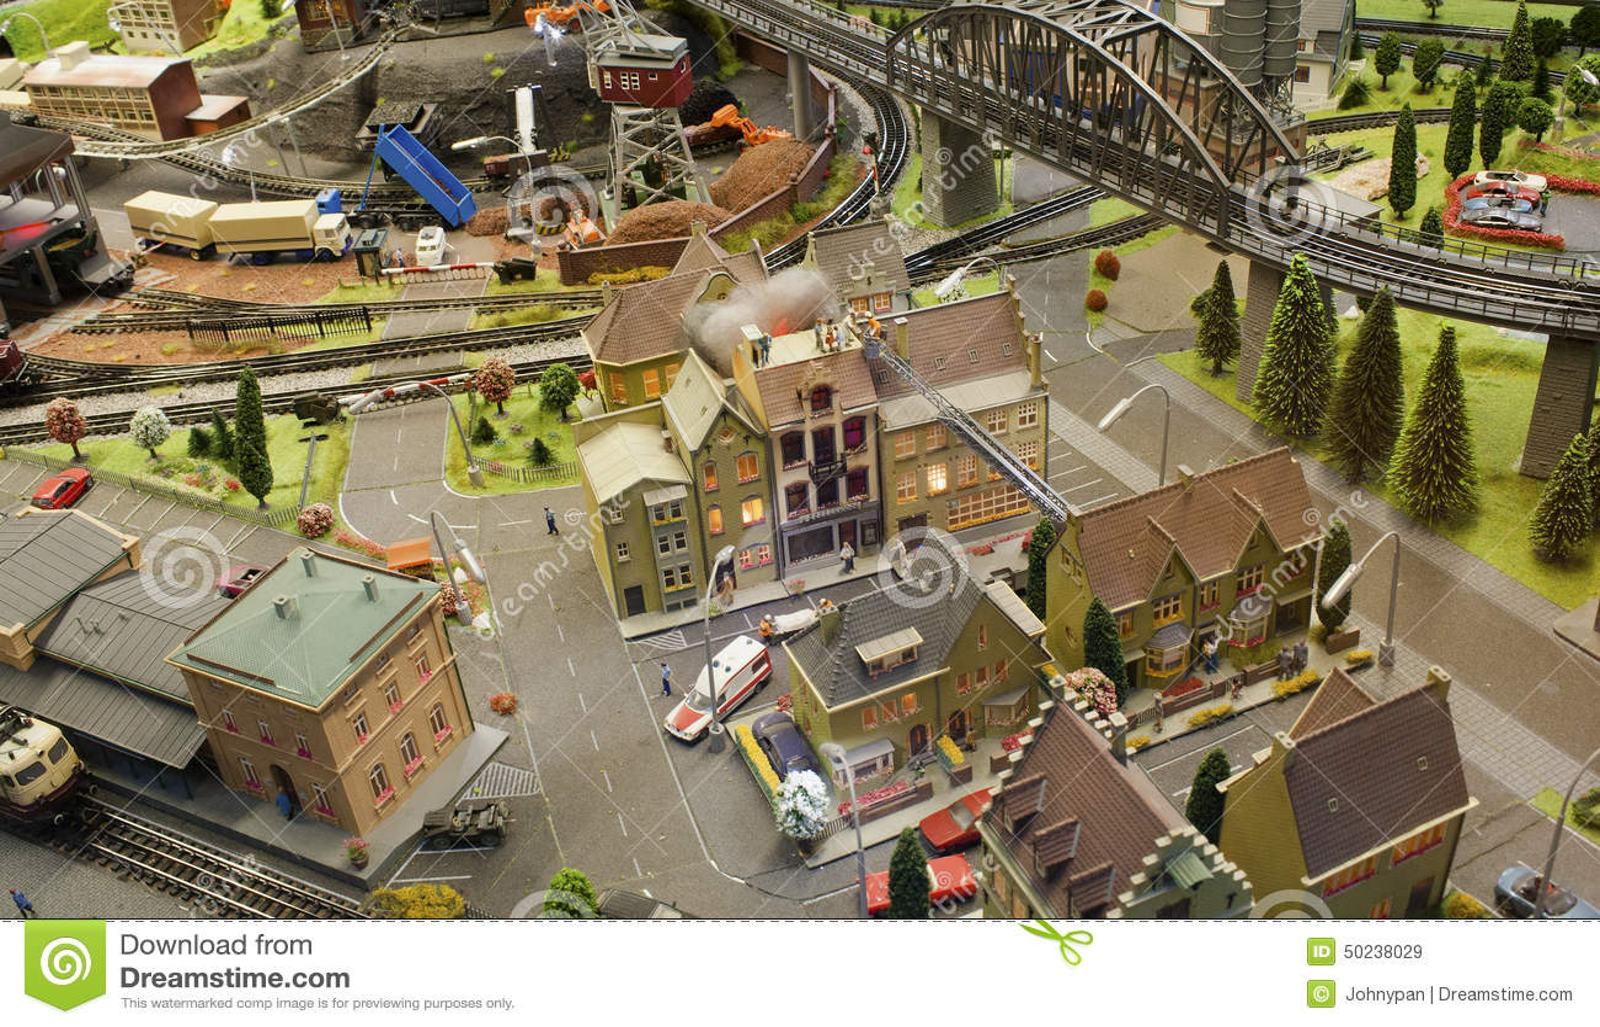 Miniature scene city